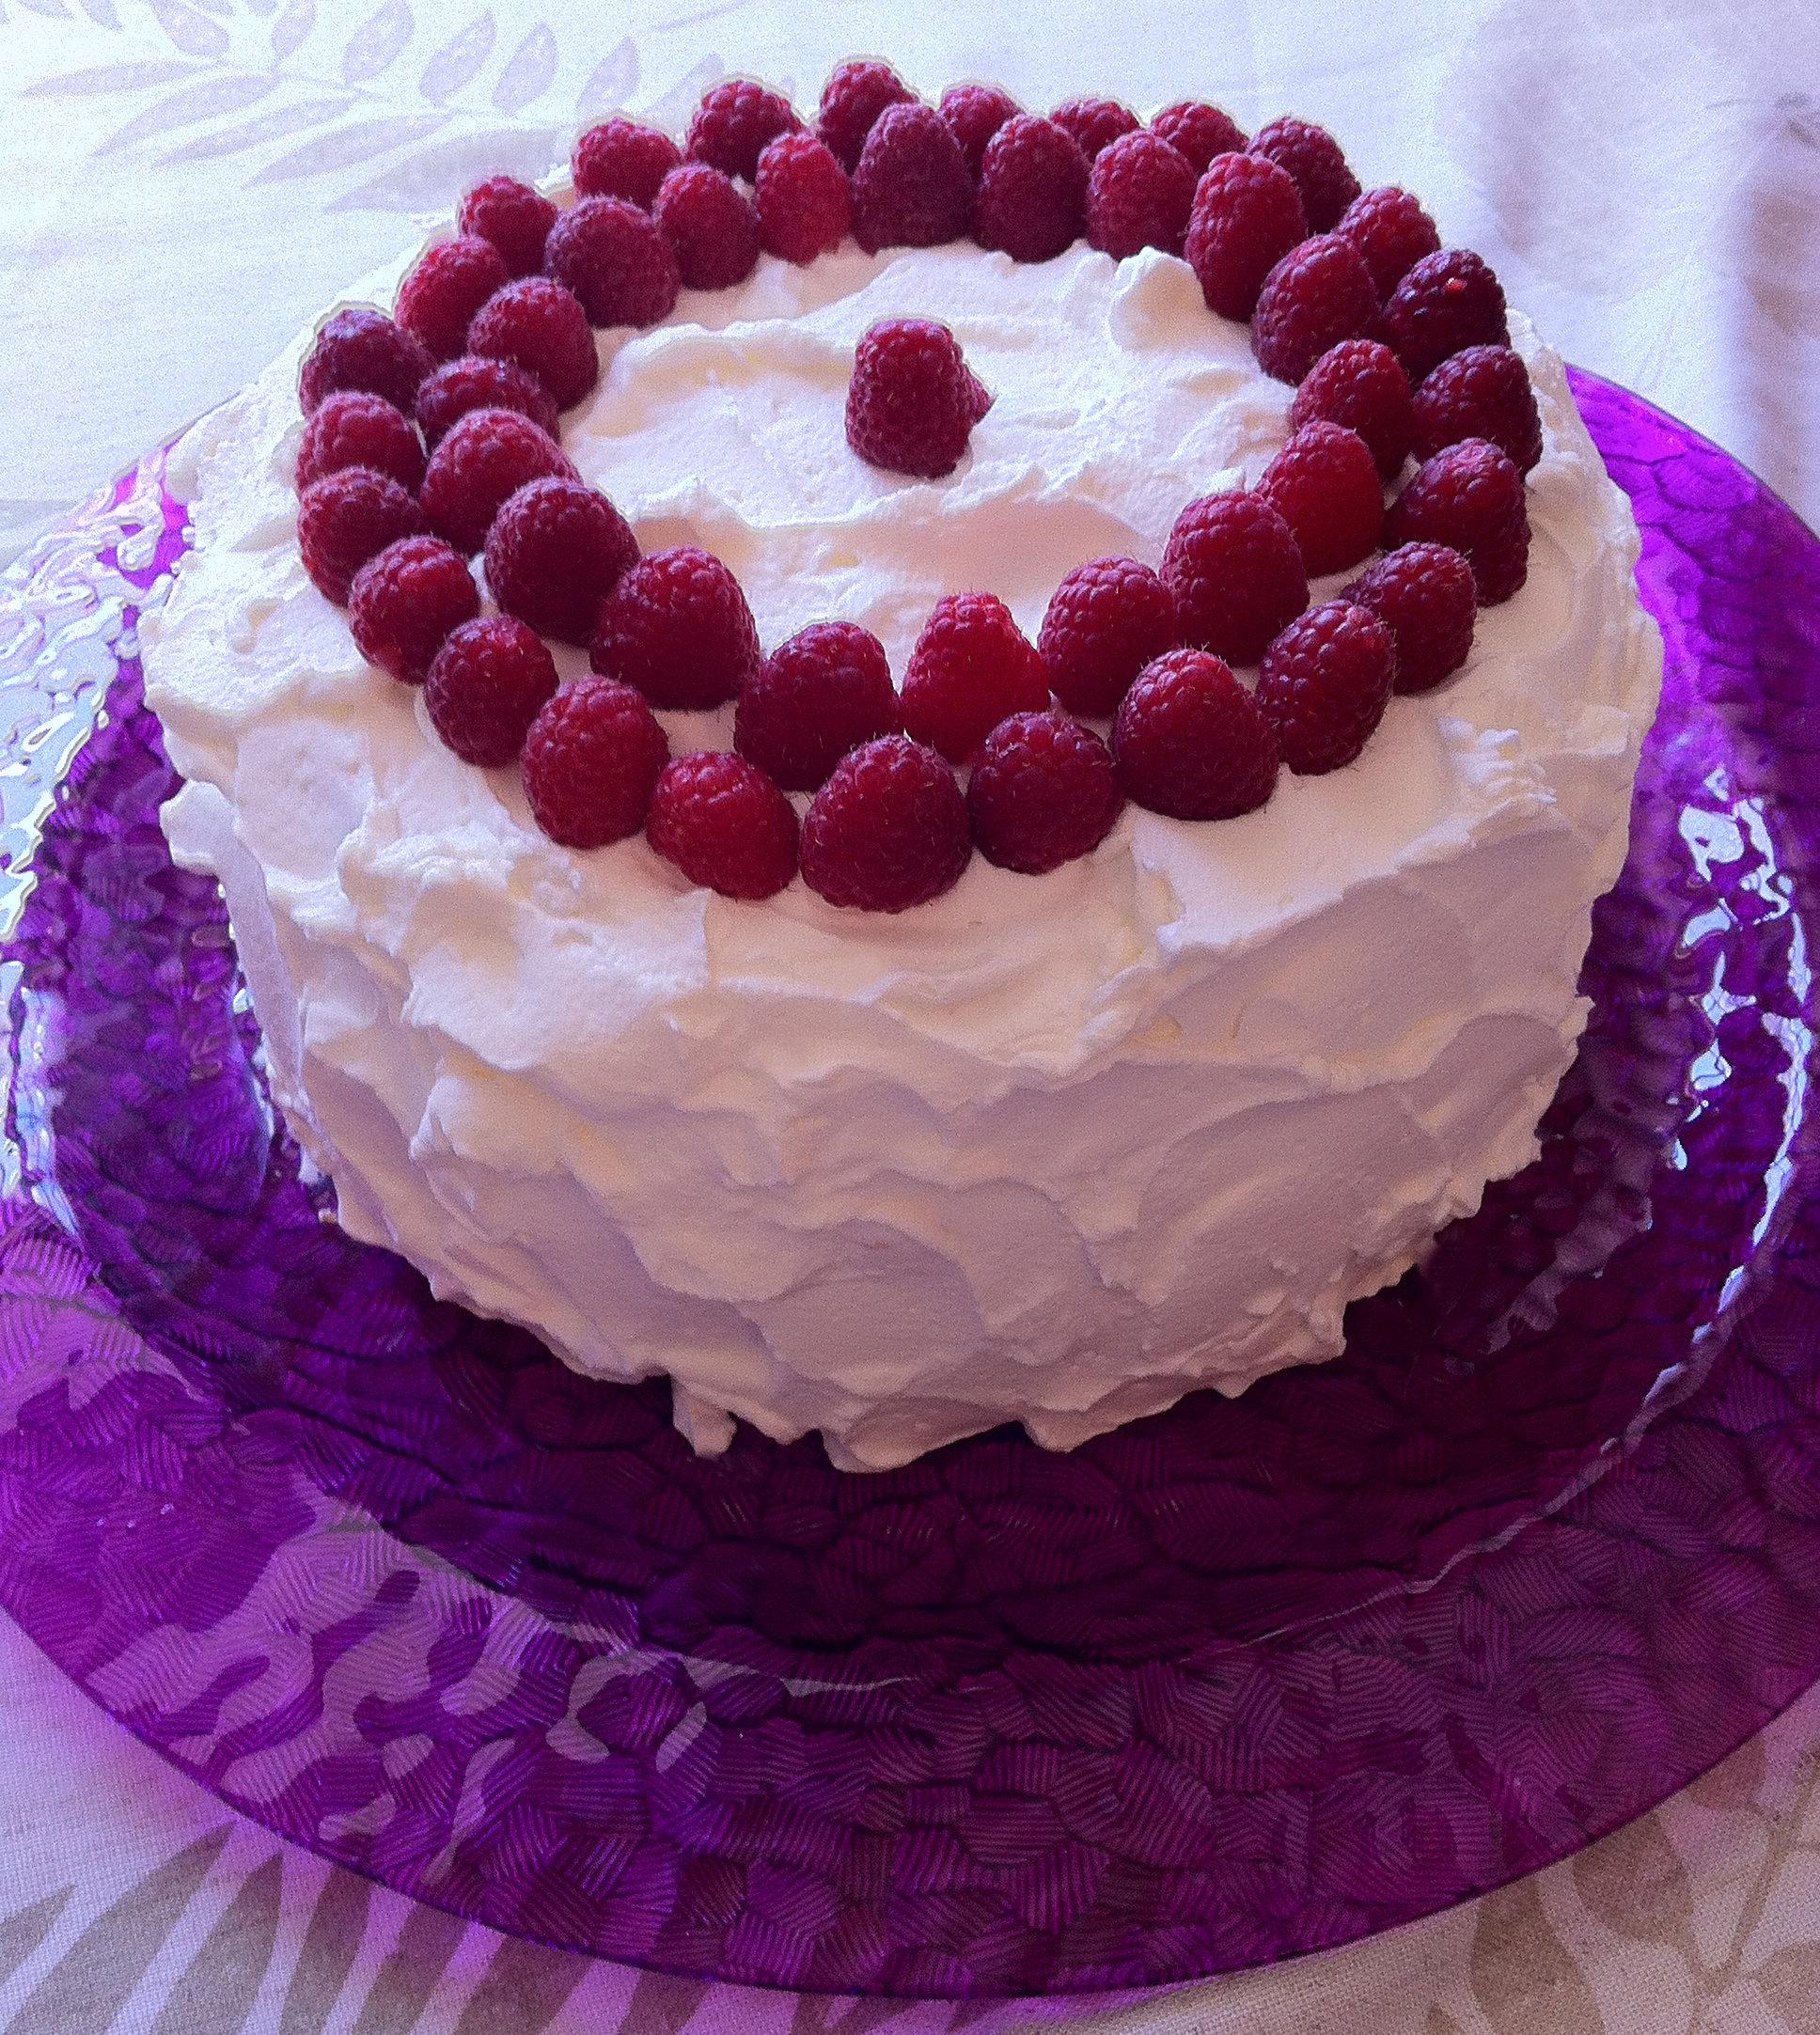 Lemon Cake With Whipped Cream Filling